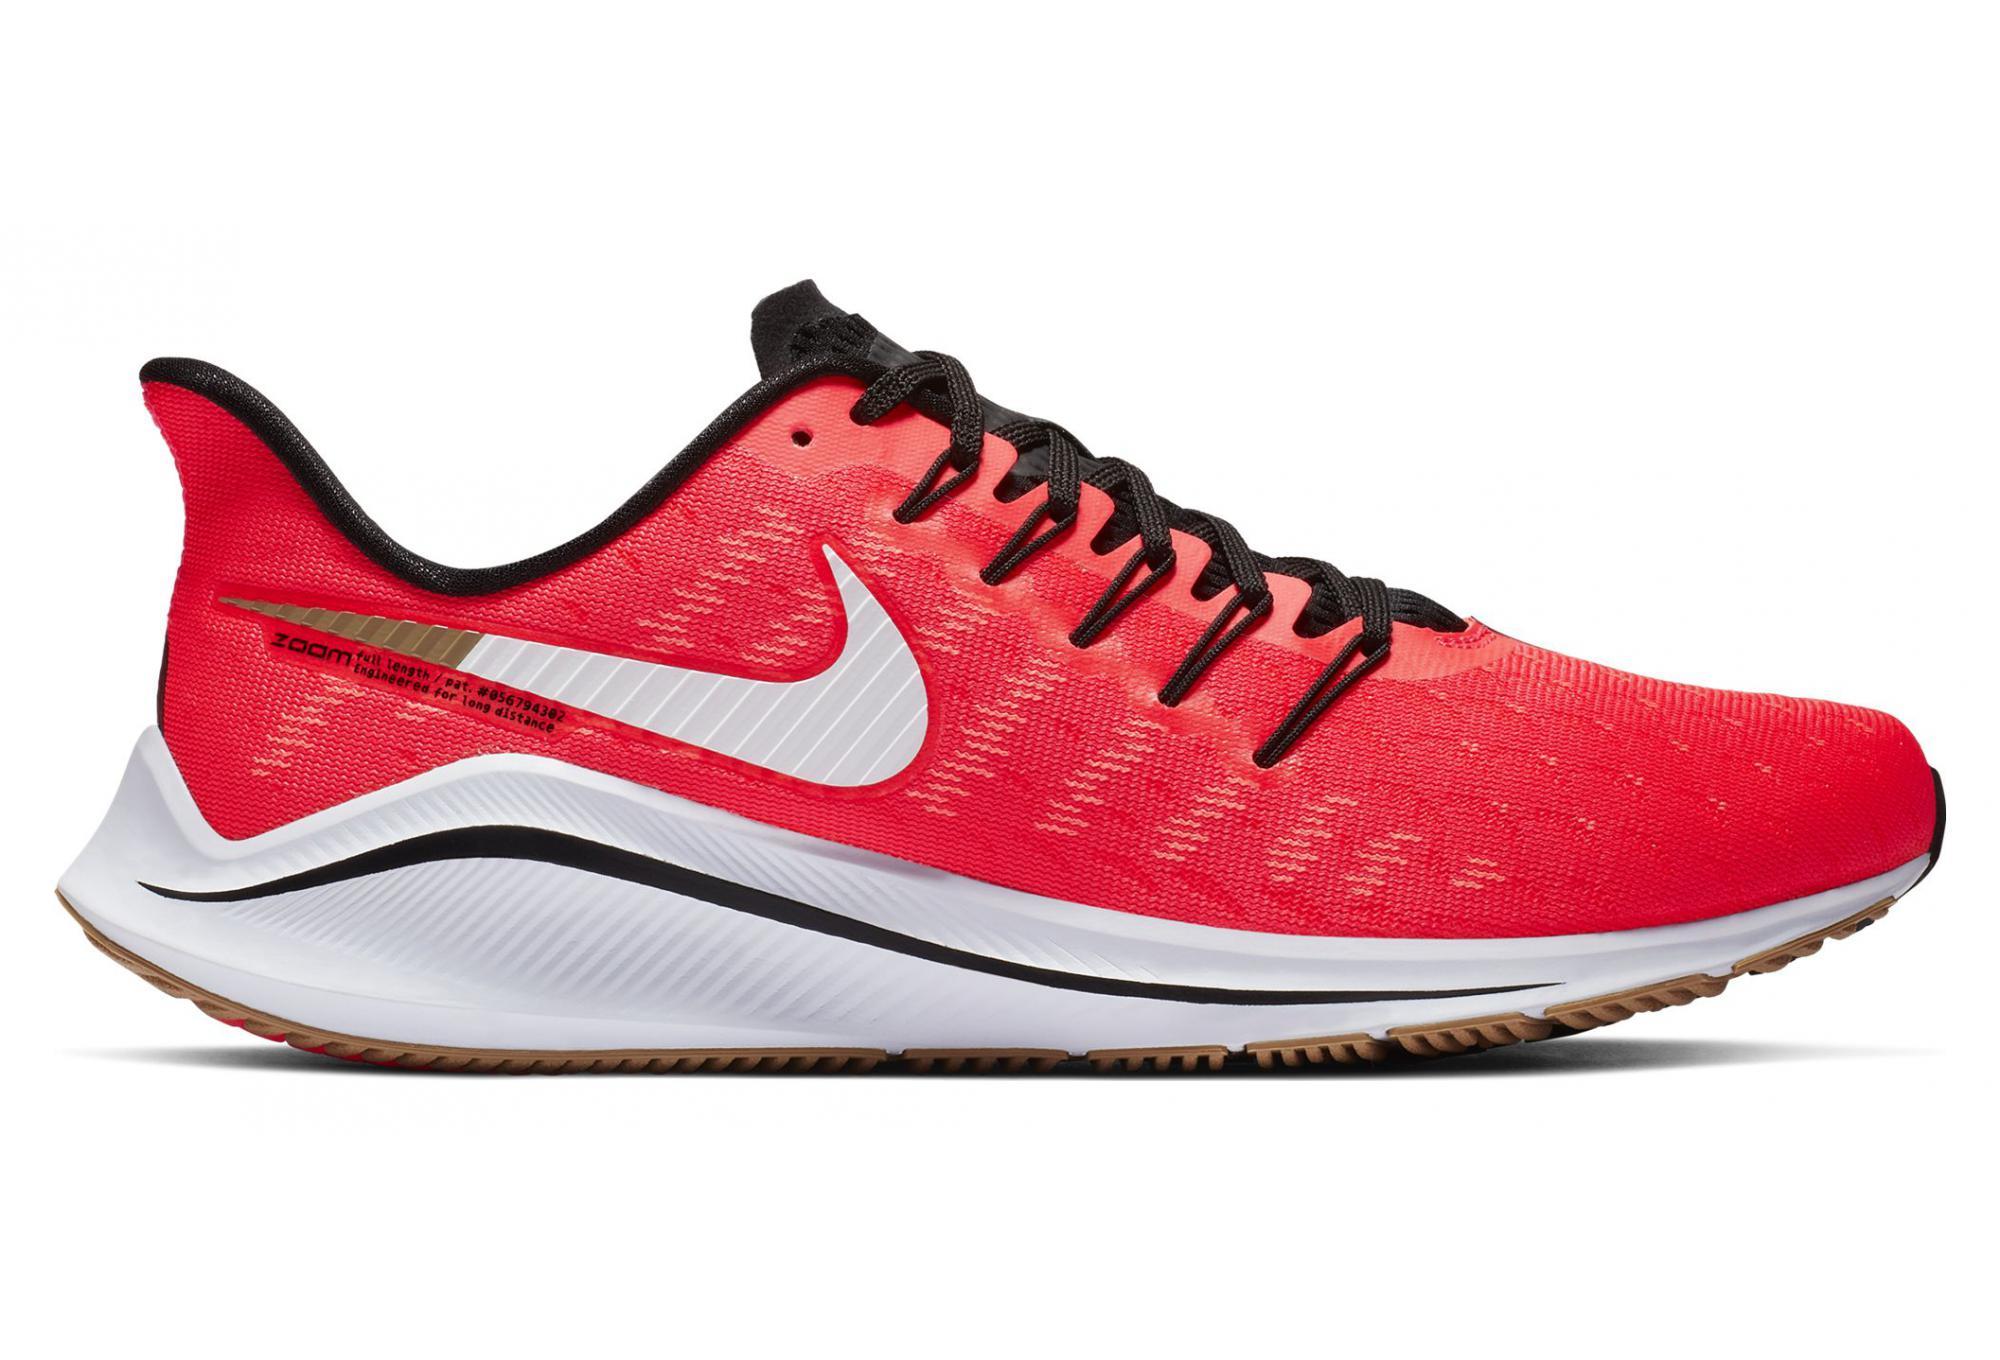 e46132786c0 Zapatillas Nike Air Zoom Vomero 14 para Hombre Rojo